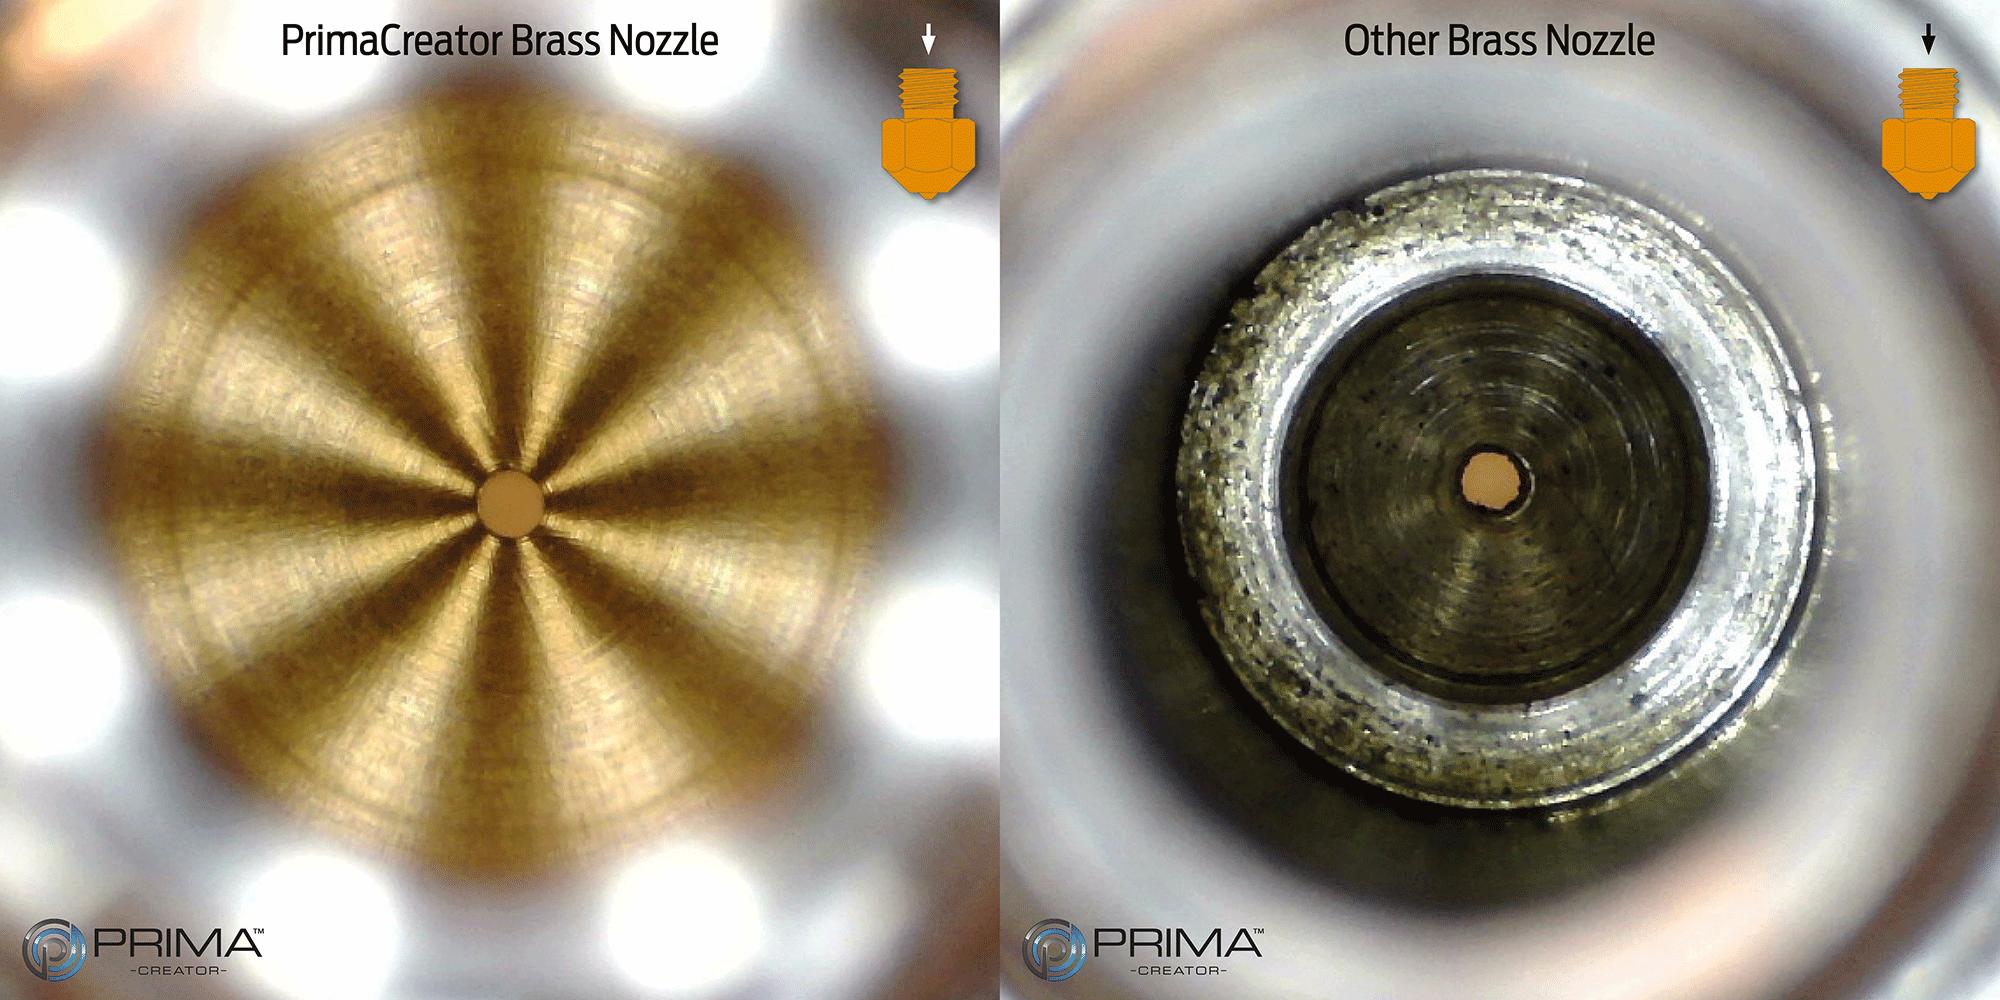 PrimaCreator 1 Stk P120 0,2 mm Messing Nozzle